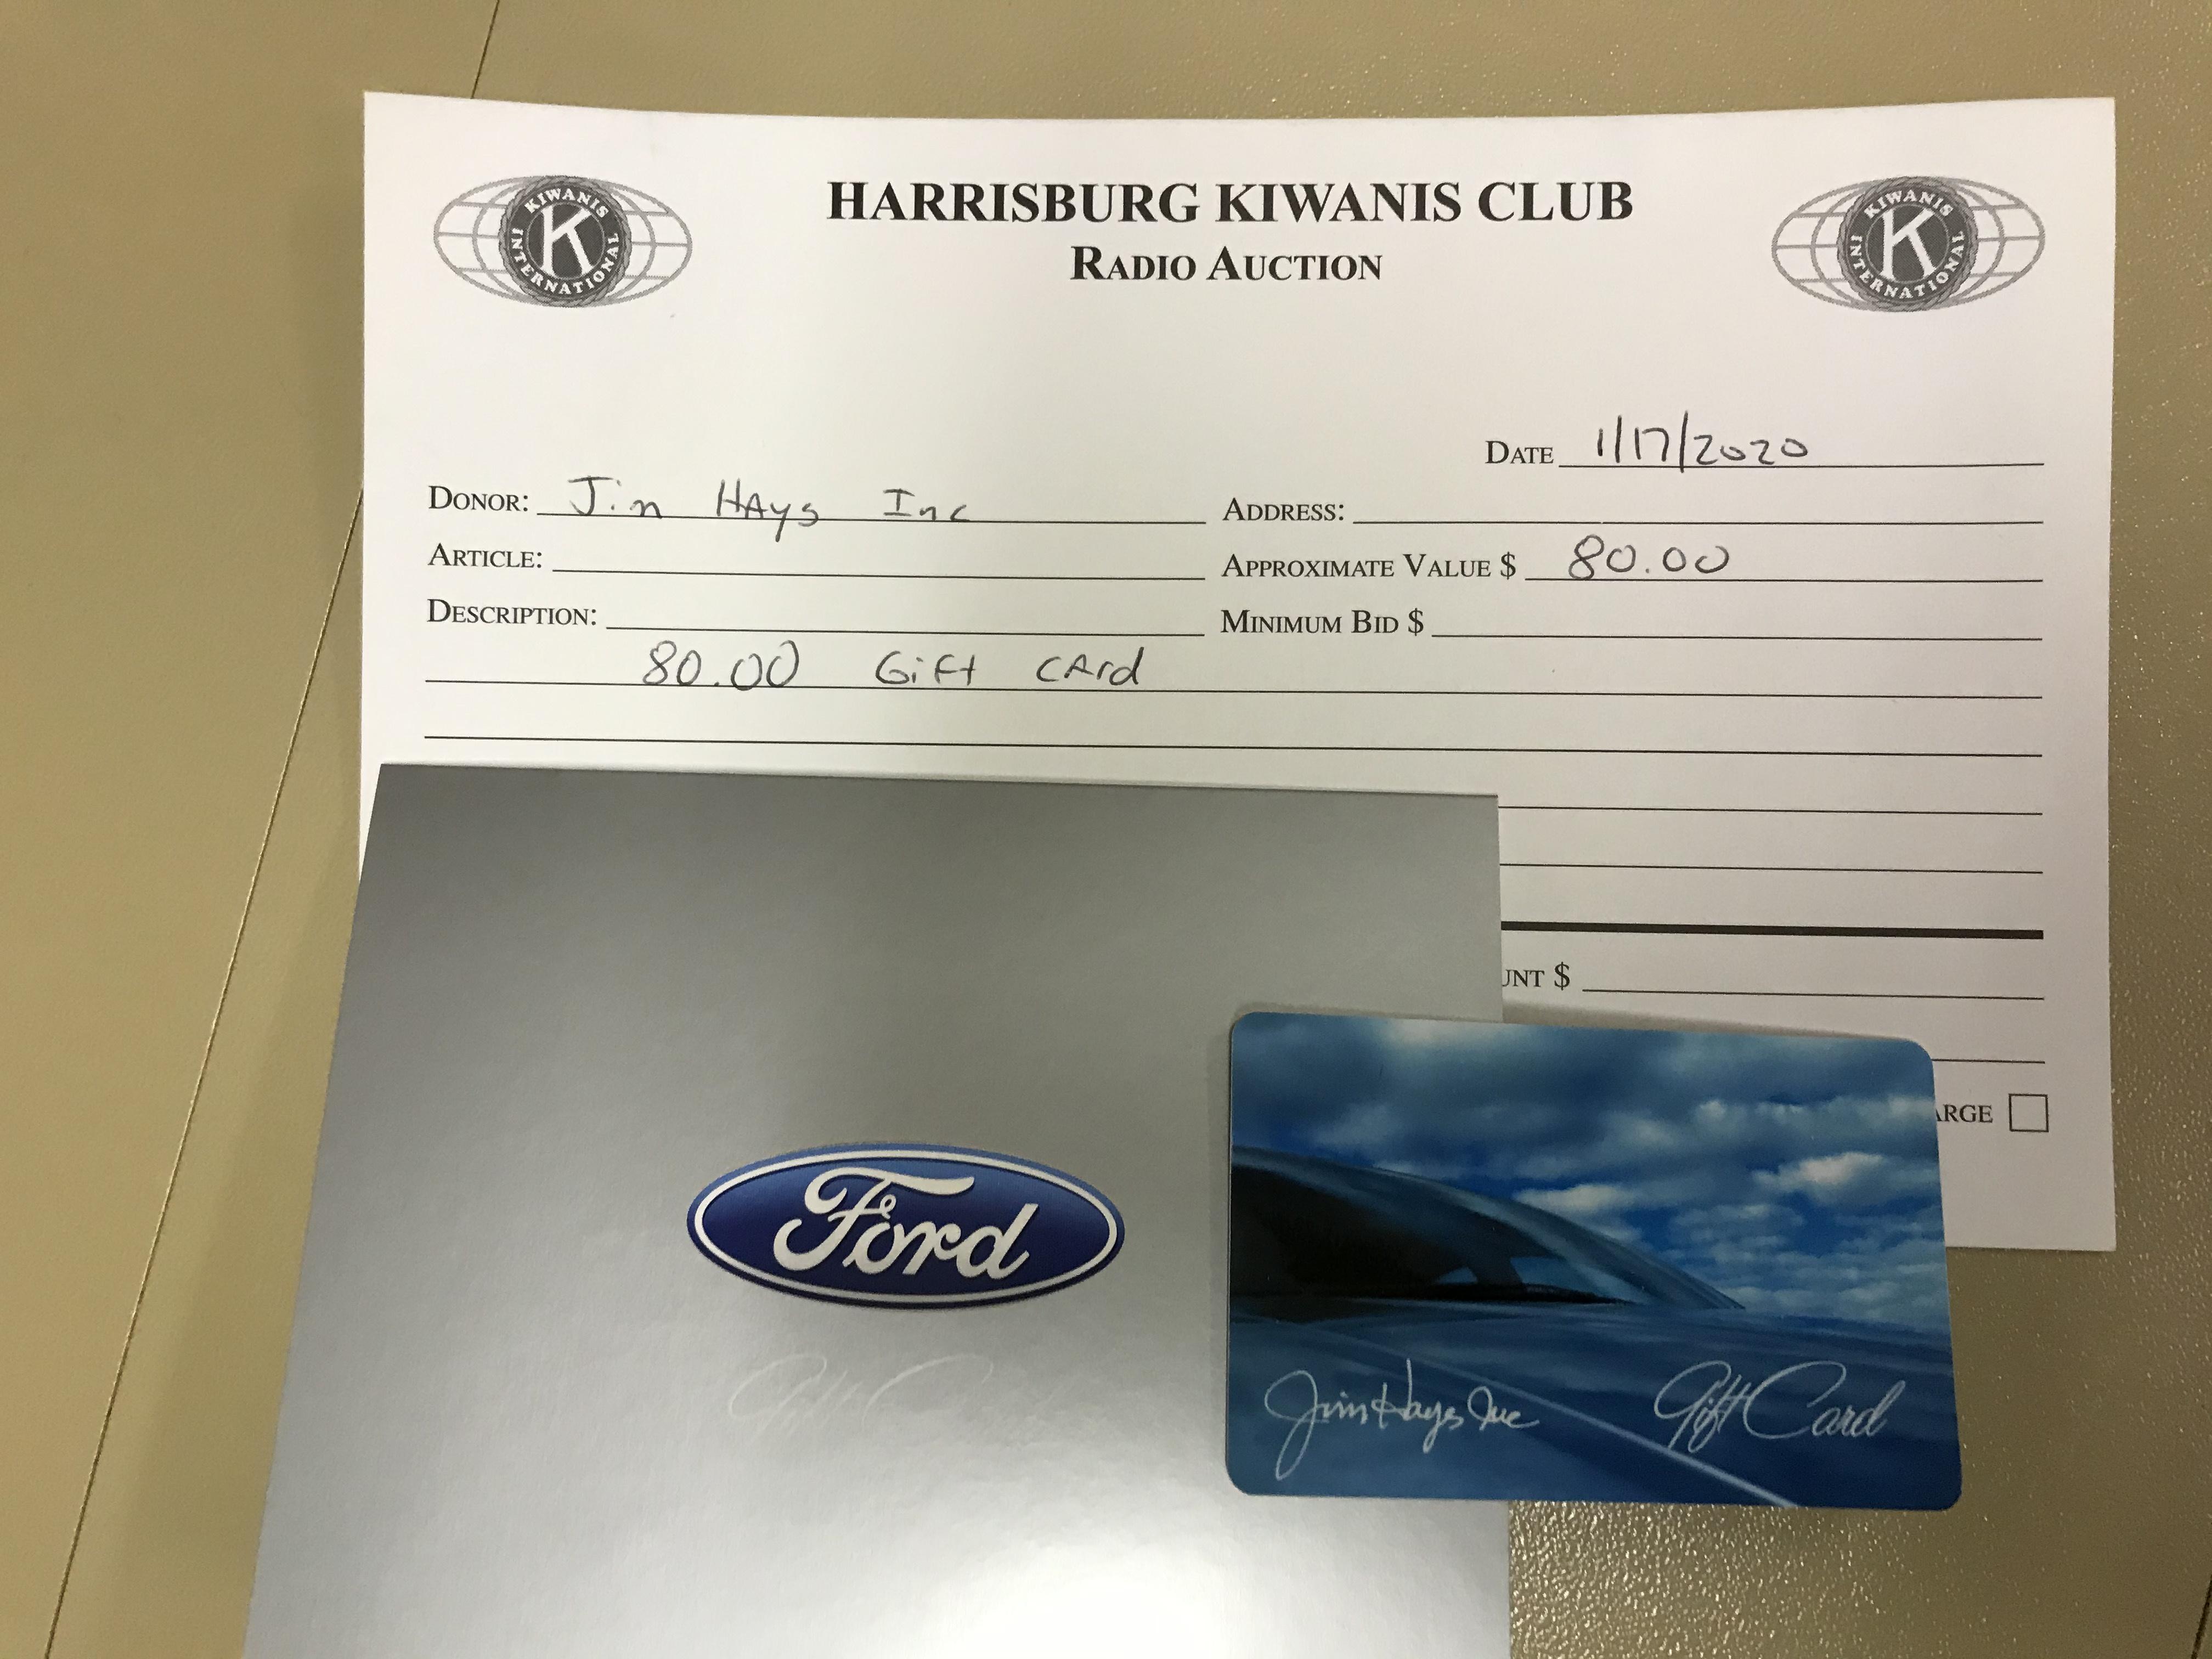 Item 408 - Jim Hayes, Inc. $80 Gift Card